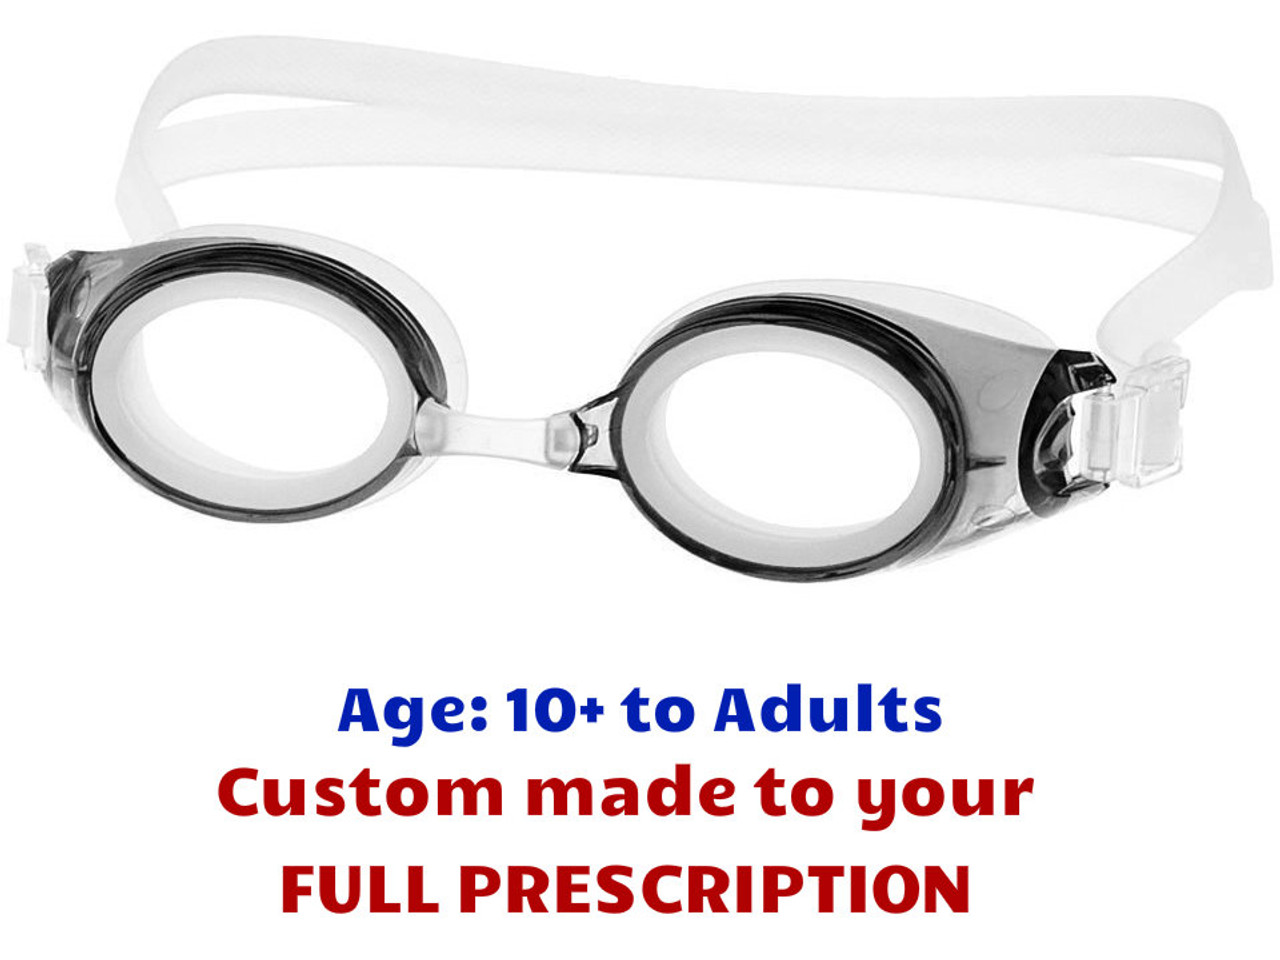 5279369a553 M2P Prescription Swim Goggles (Custom Made to Prescription) Grey ...